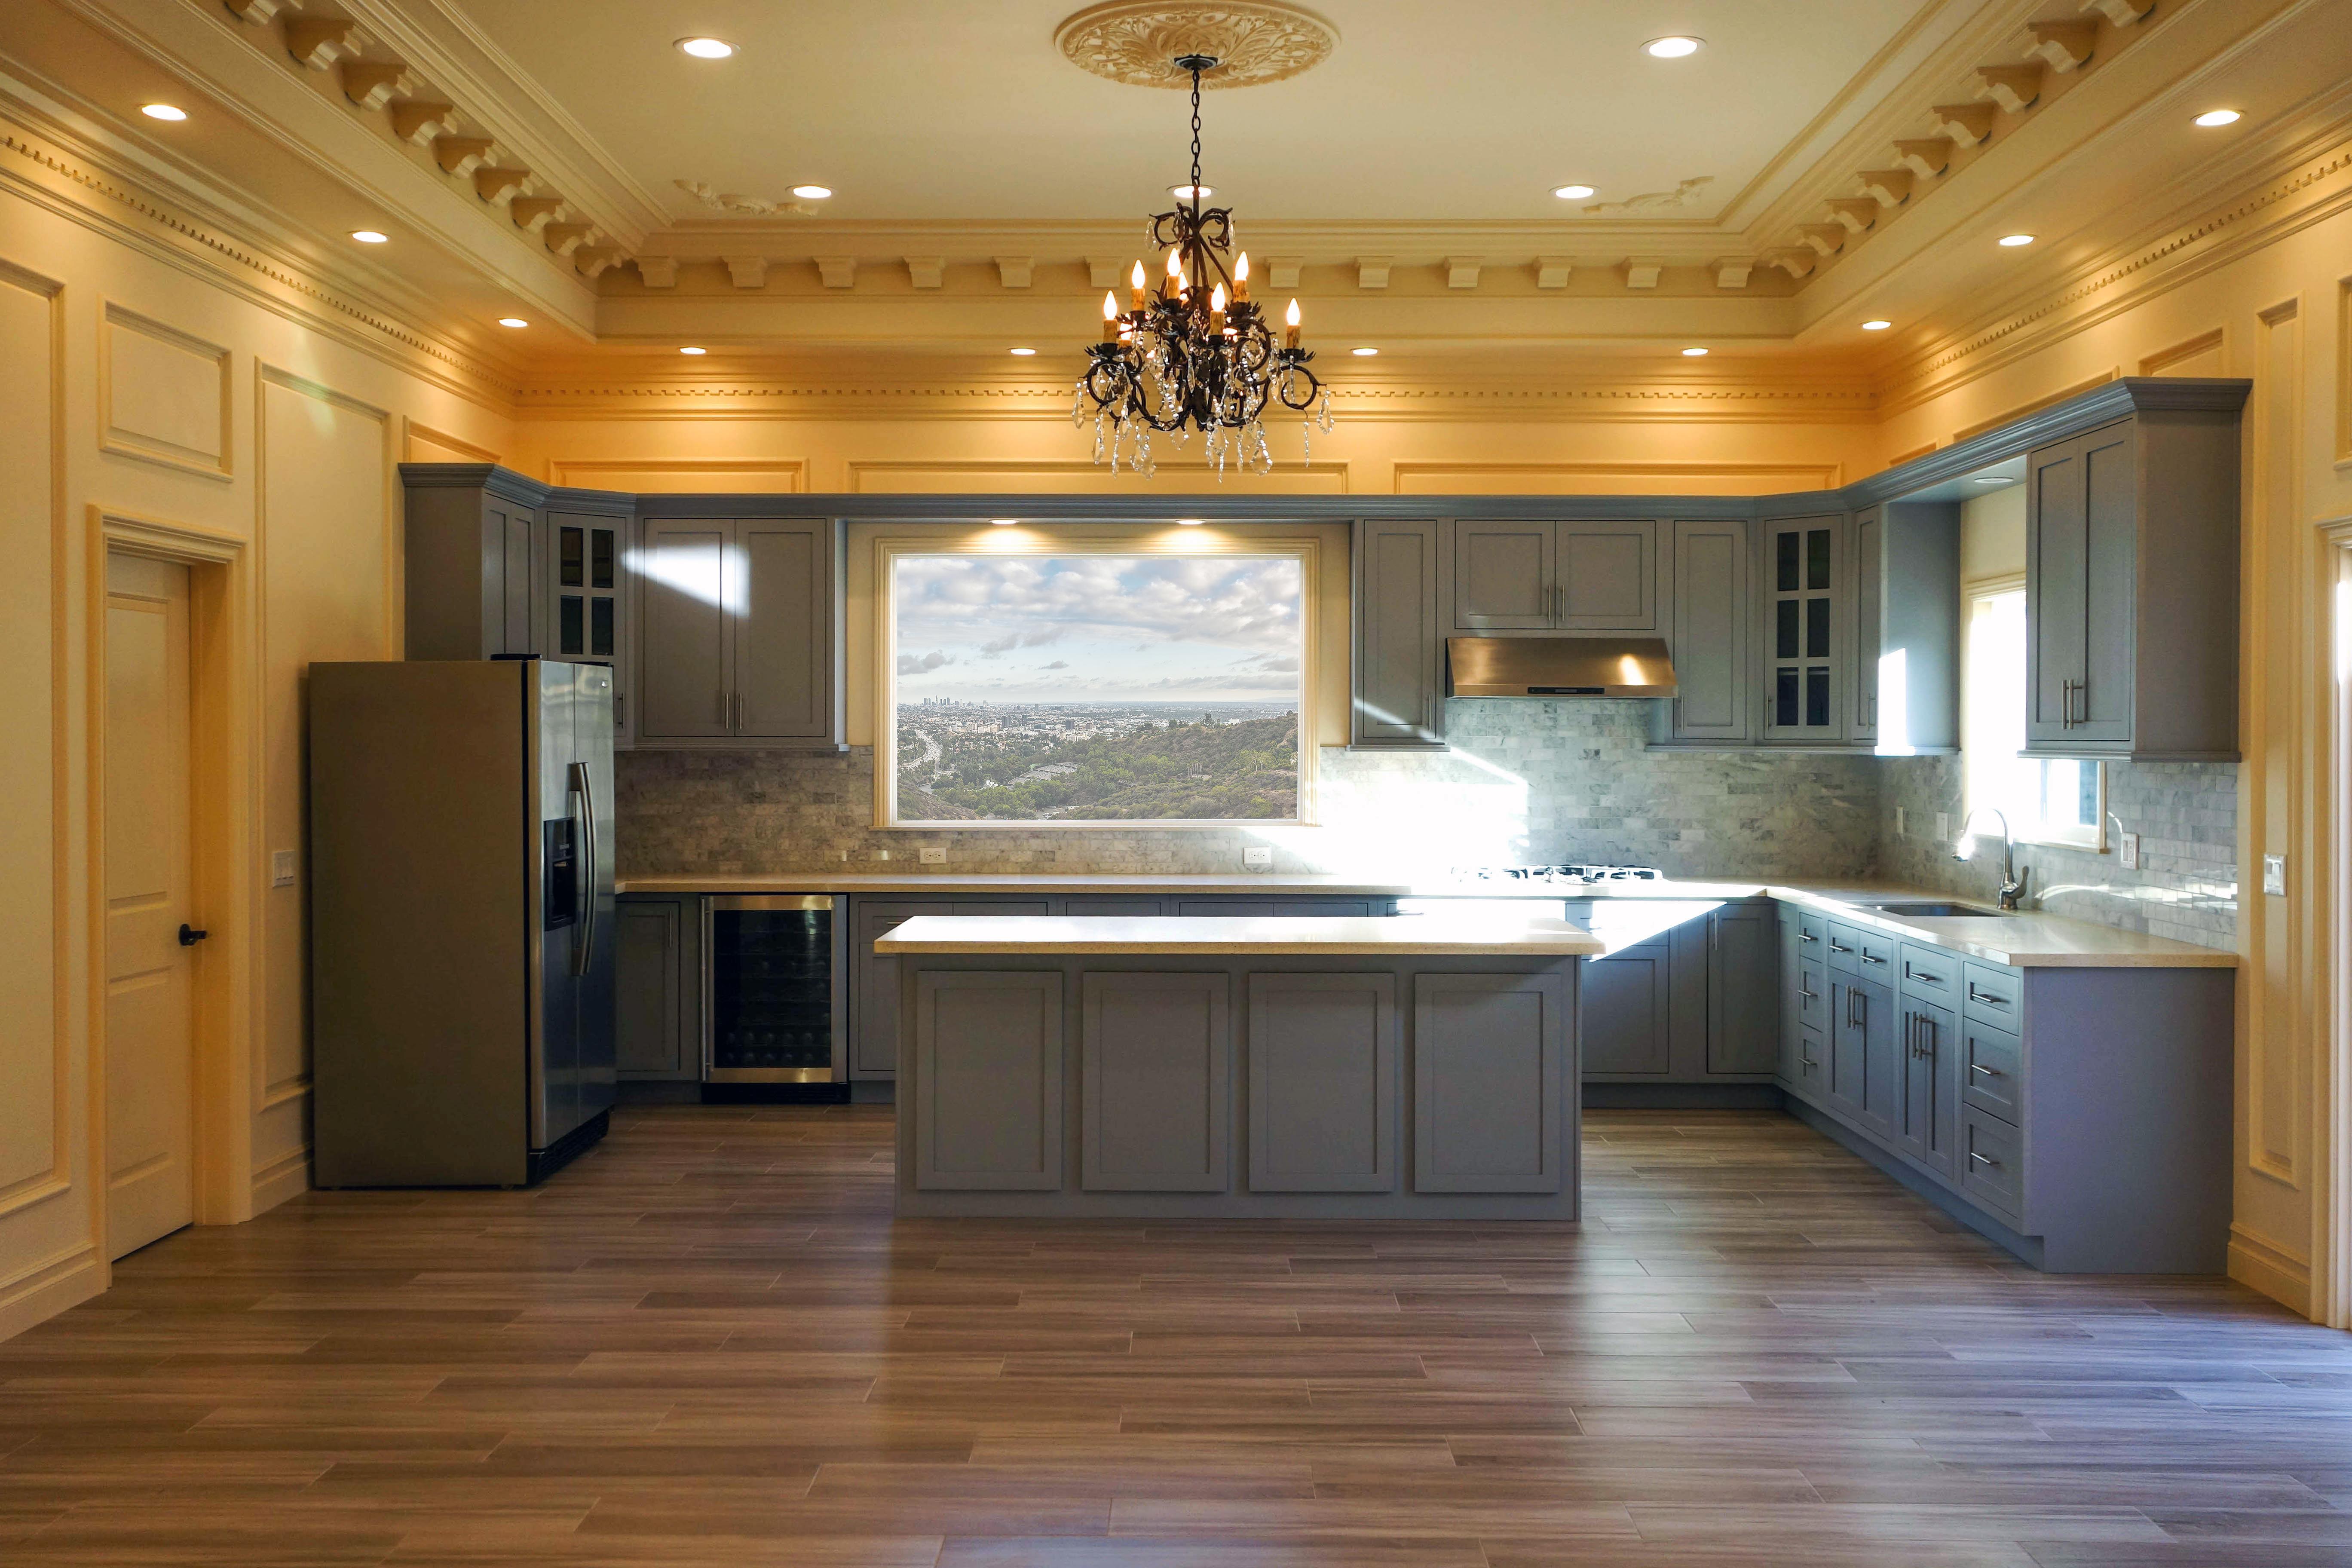 Home | NU Image Kitchen and Bath Design